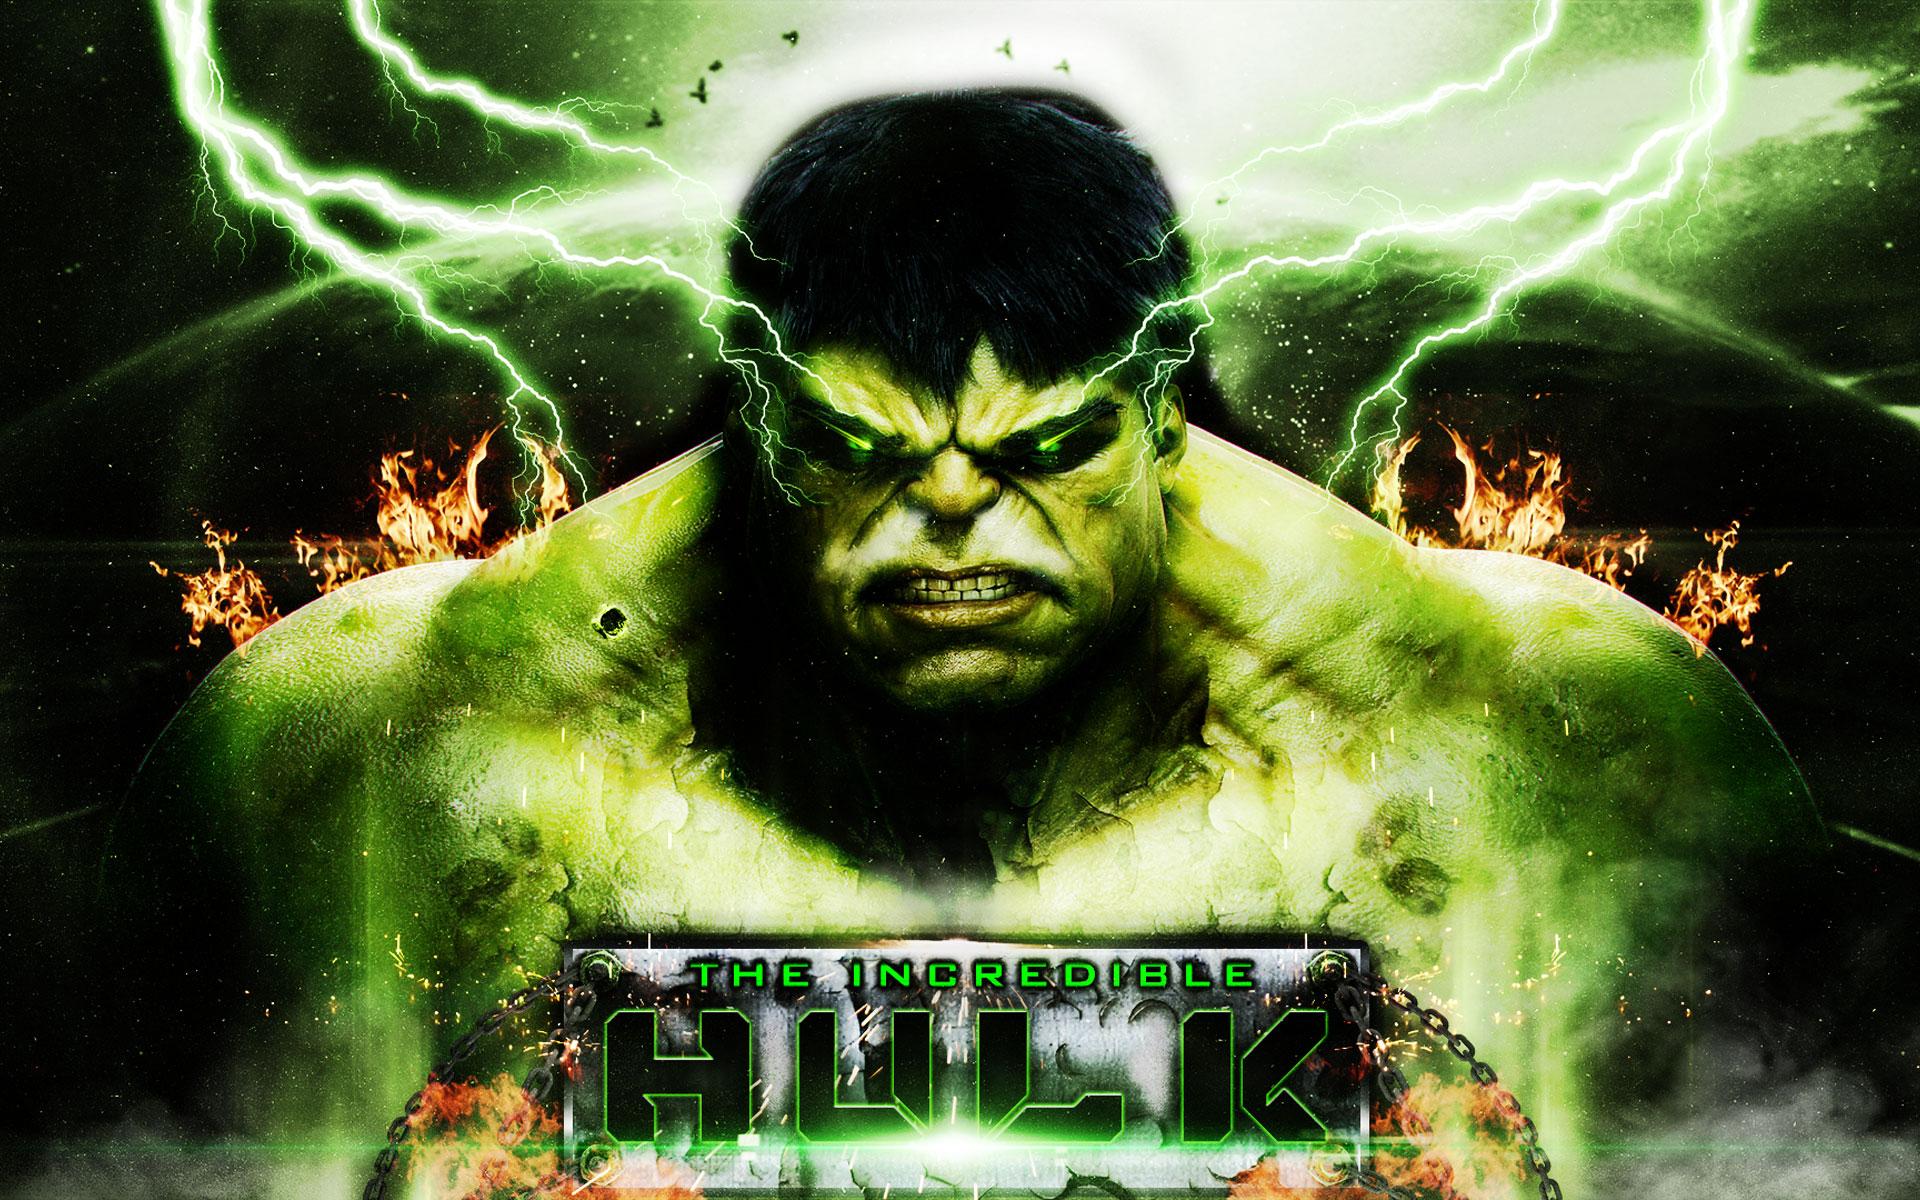 Ultra HD Incredible Hulk Wallpapers 13GY684   4USkY 1920x1200